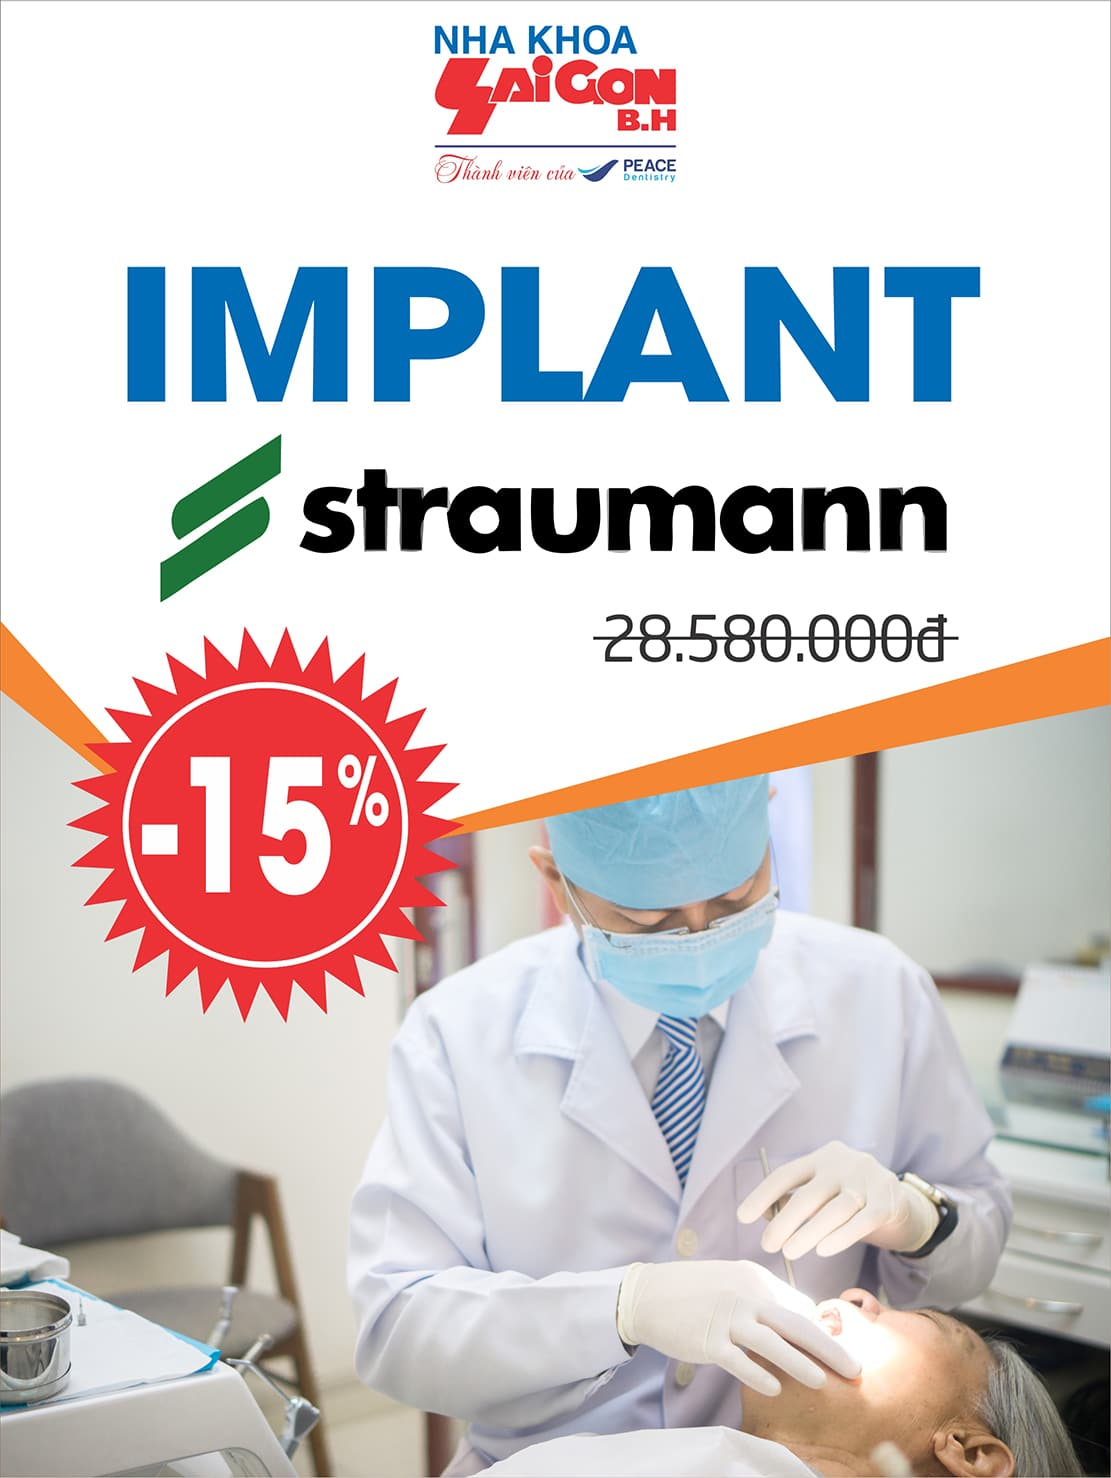 Tại sao bác sĩ nha khoa tin dùng Implant Straumann?